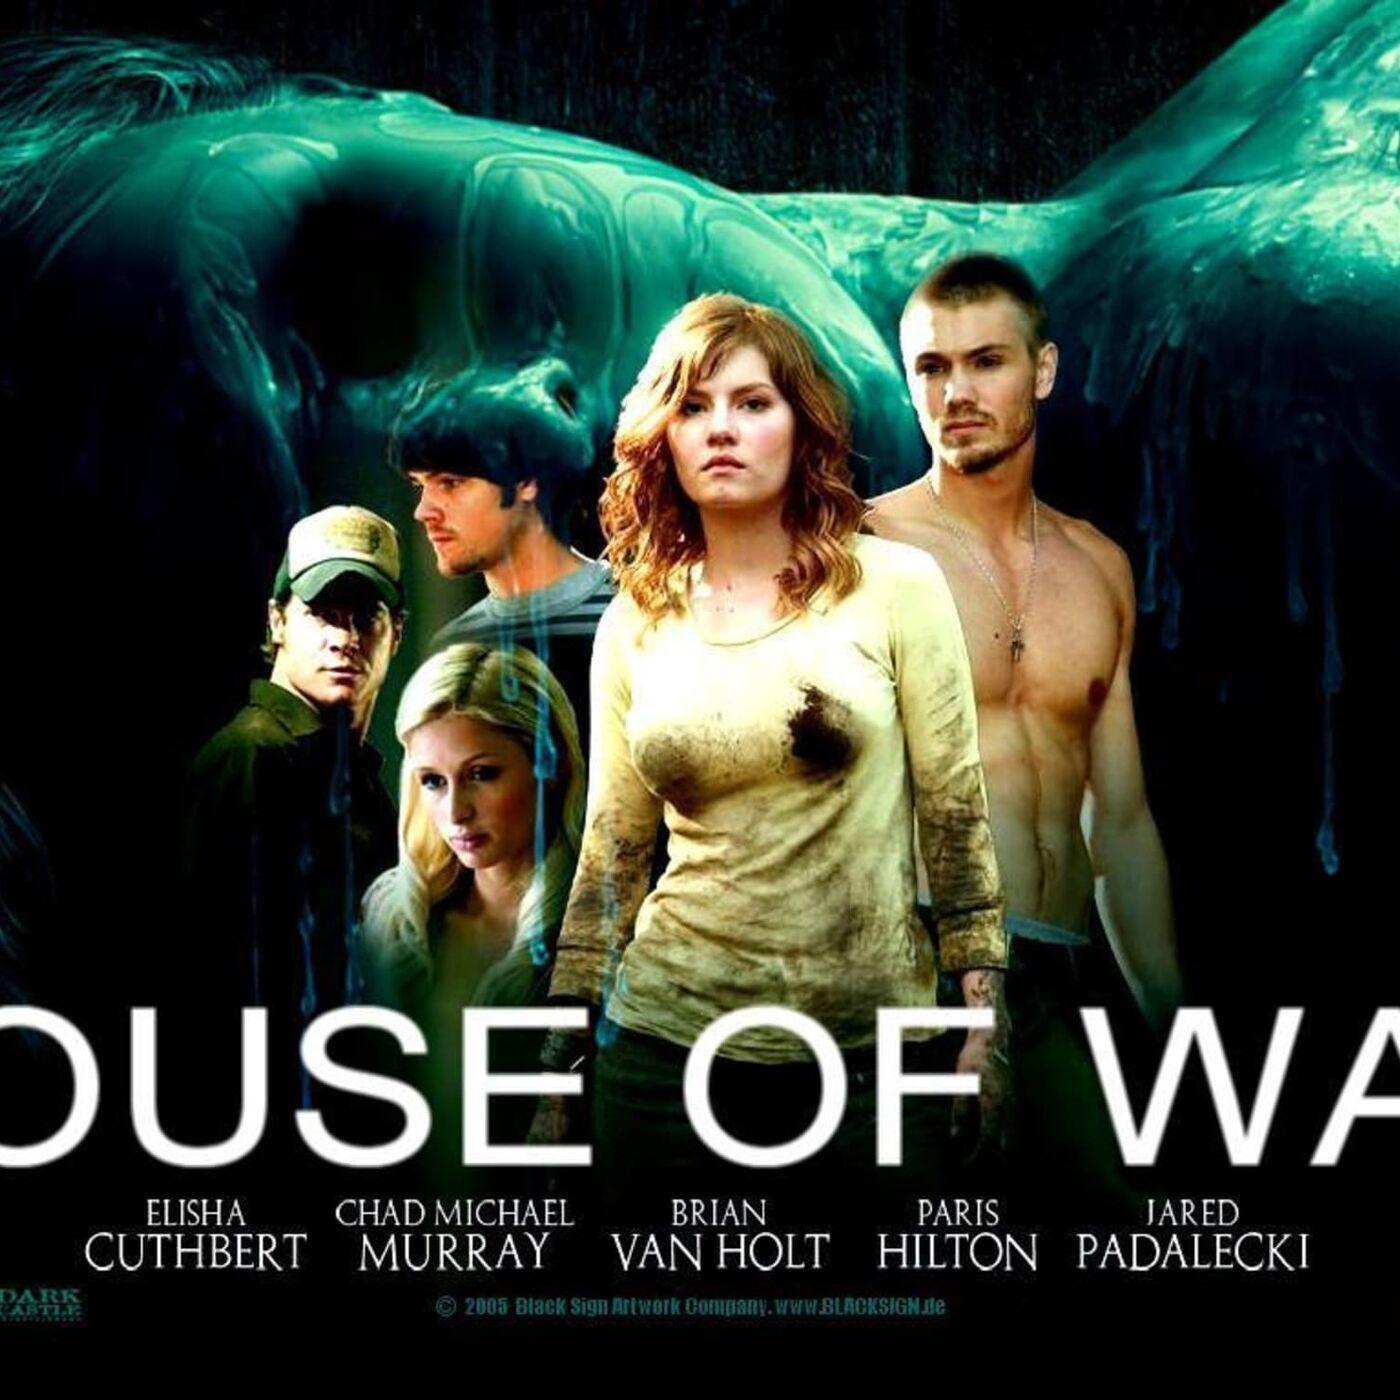 31 Days of Halloween: House of Wax (2005)